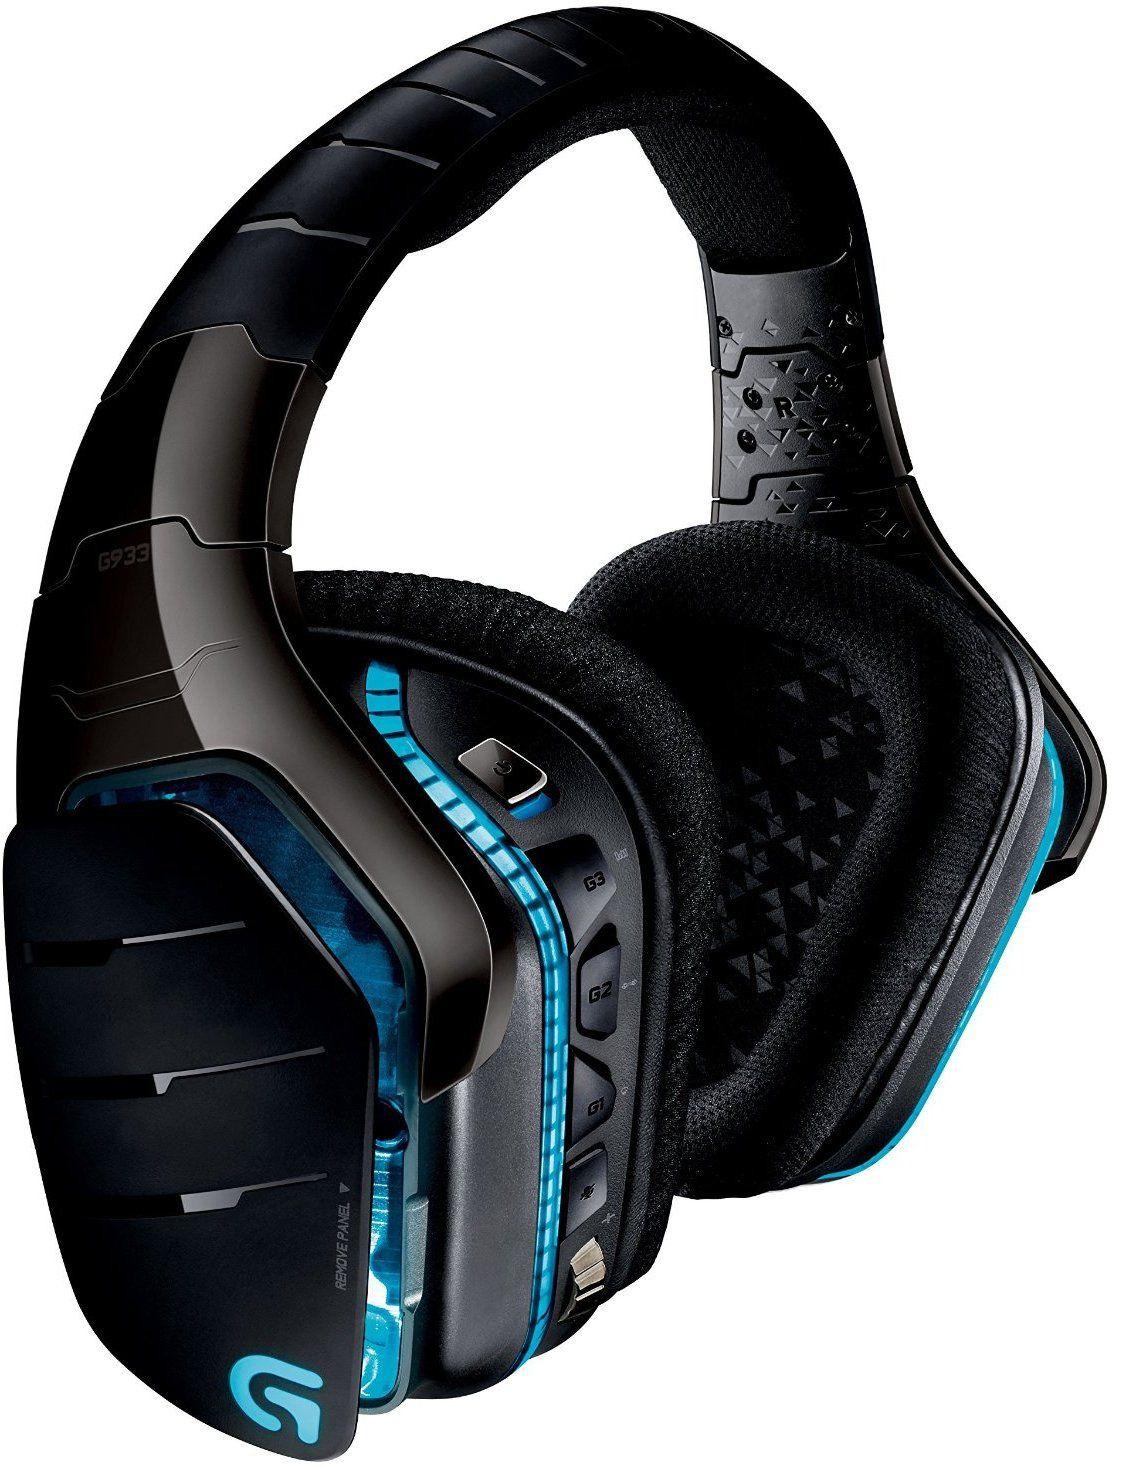 Гейминг слушалки Logitech G933 Artemis Spectrum - 7.1 Surround, безжични, черни - 1